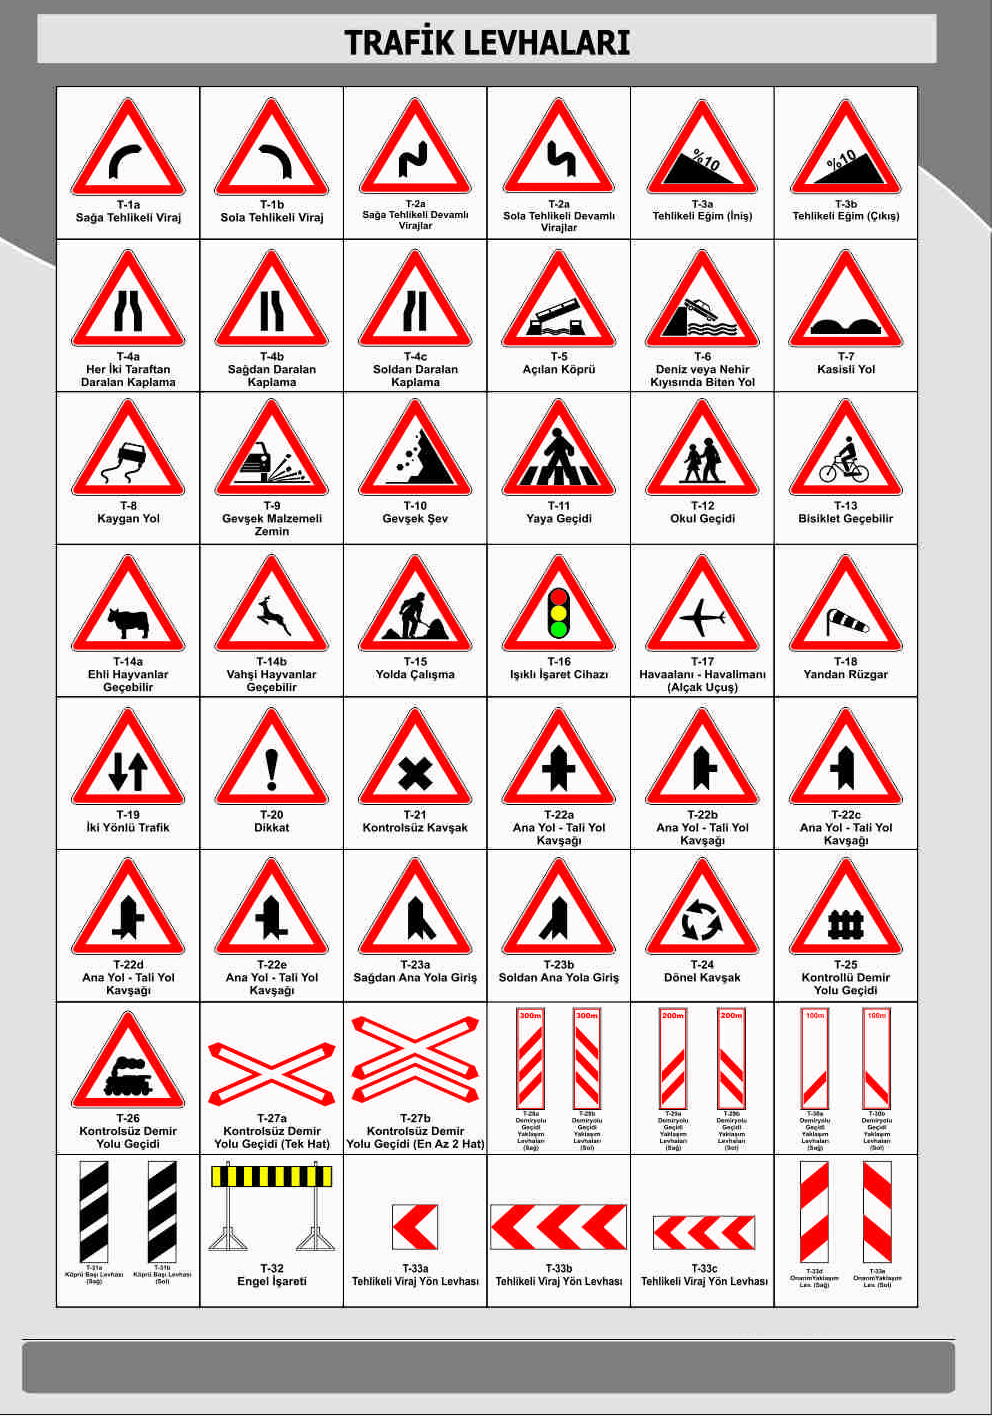 trafik-levhalari-corum-is-guvenligi-malzemeleri-ekipmanlari-1